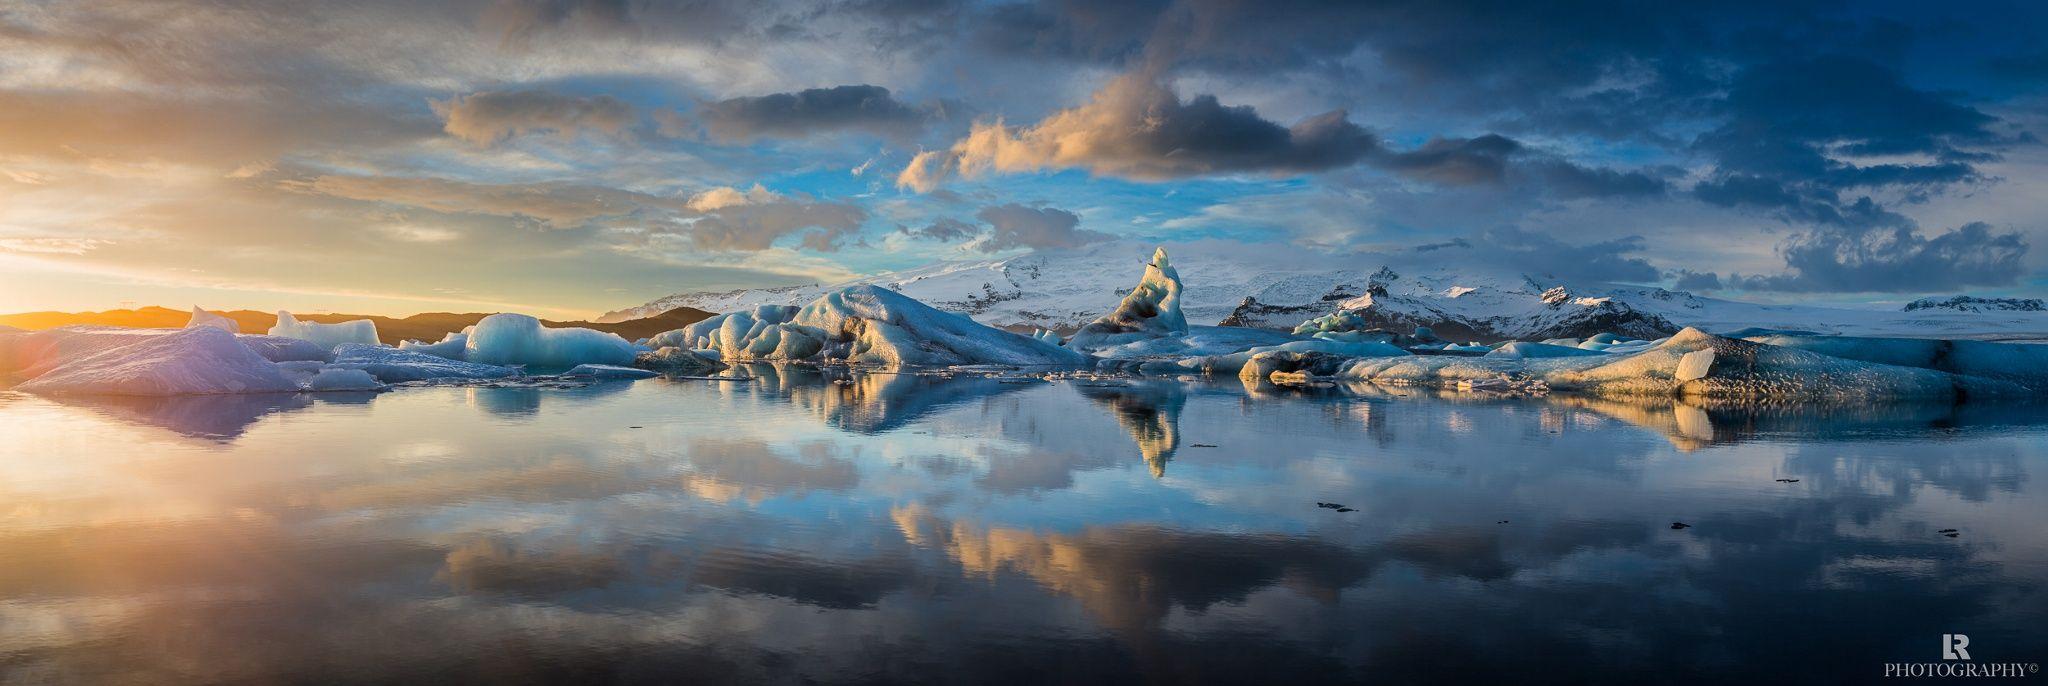 Jökulsárlón lagoon in southeastern Iceland. Photo by Lorenzo Riva [2048x686]